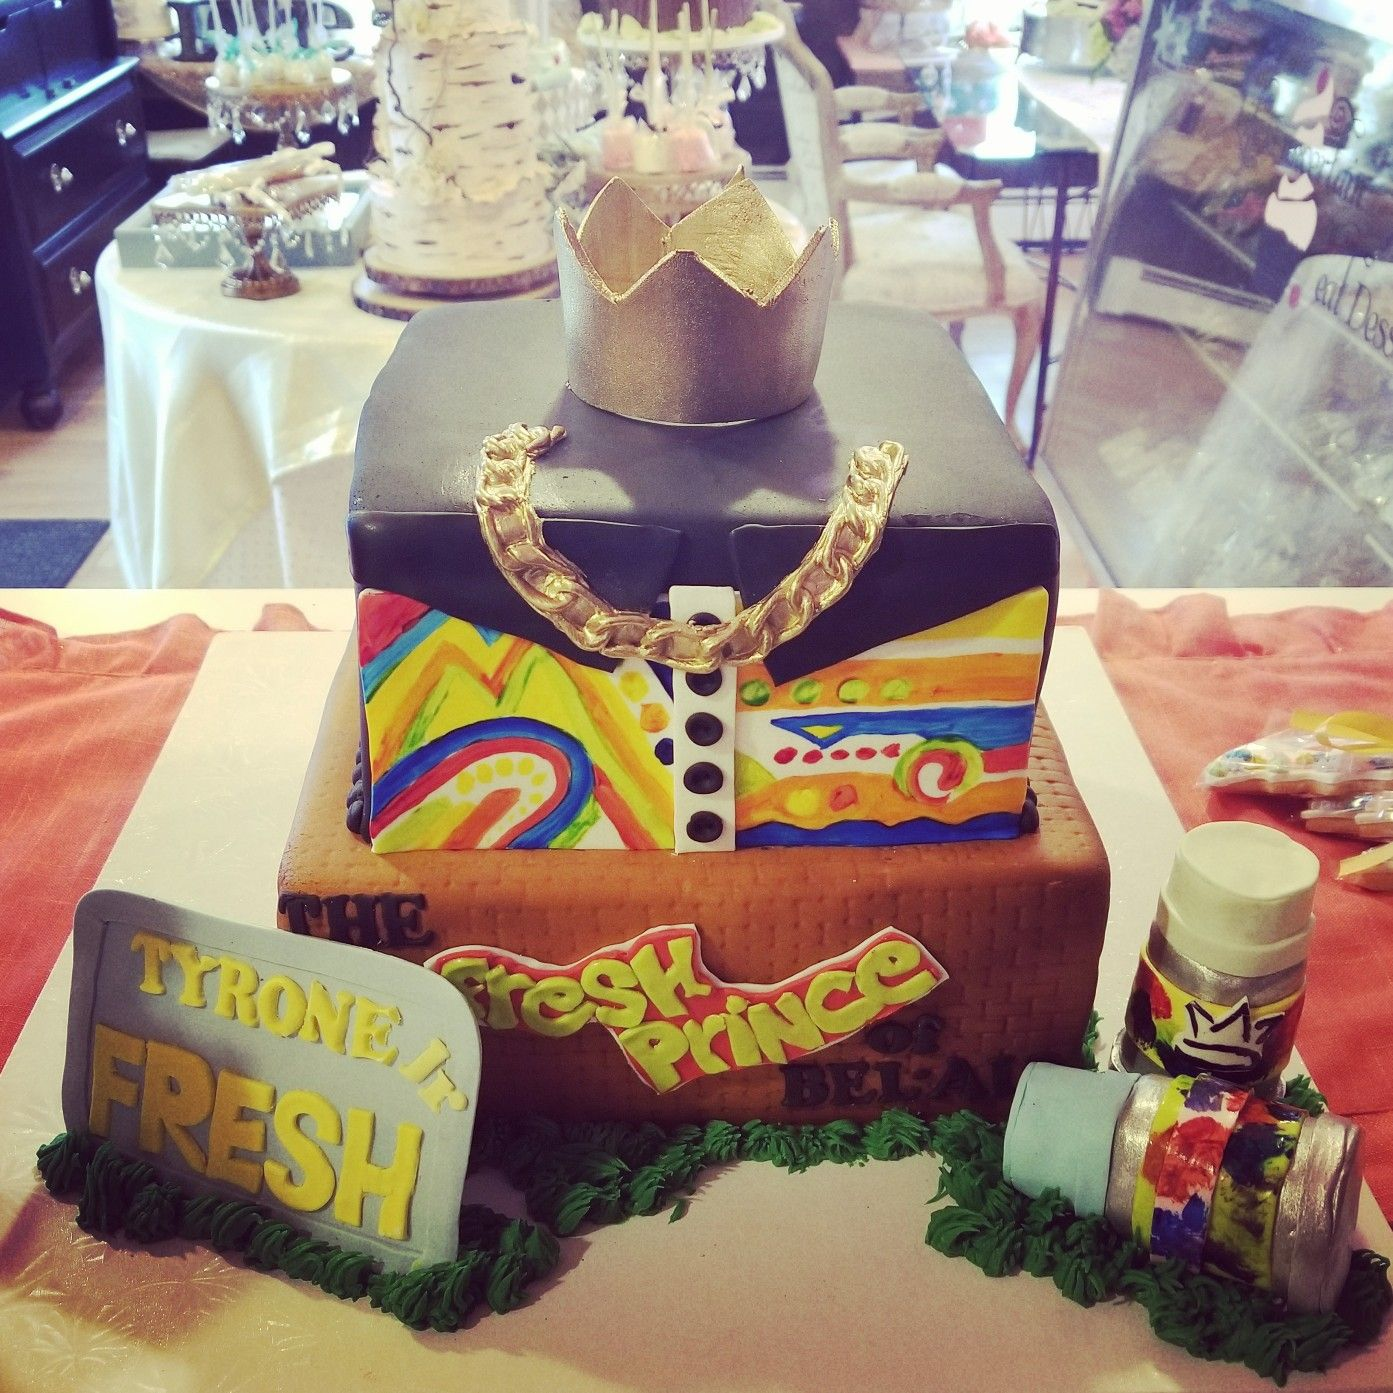 Fresh prince of bel air 1st birthday cake #carinaedolce www ...